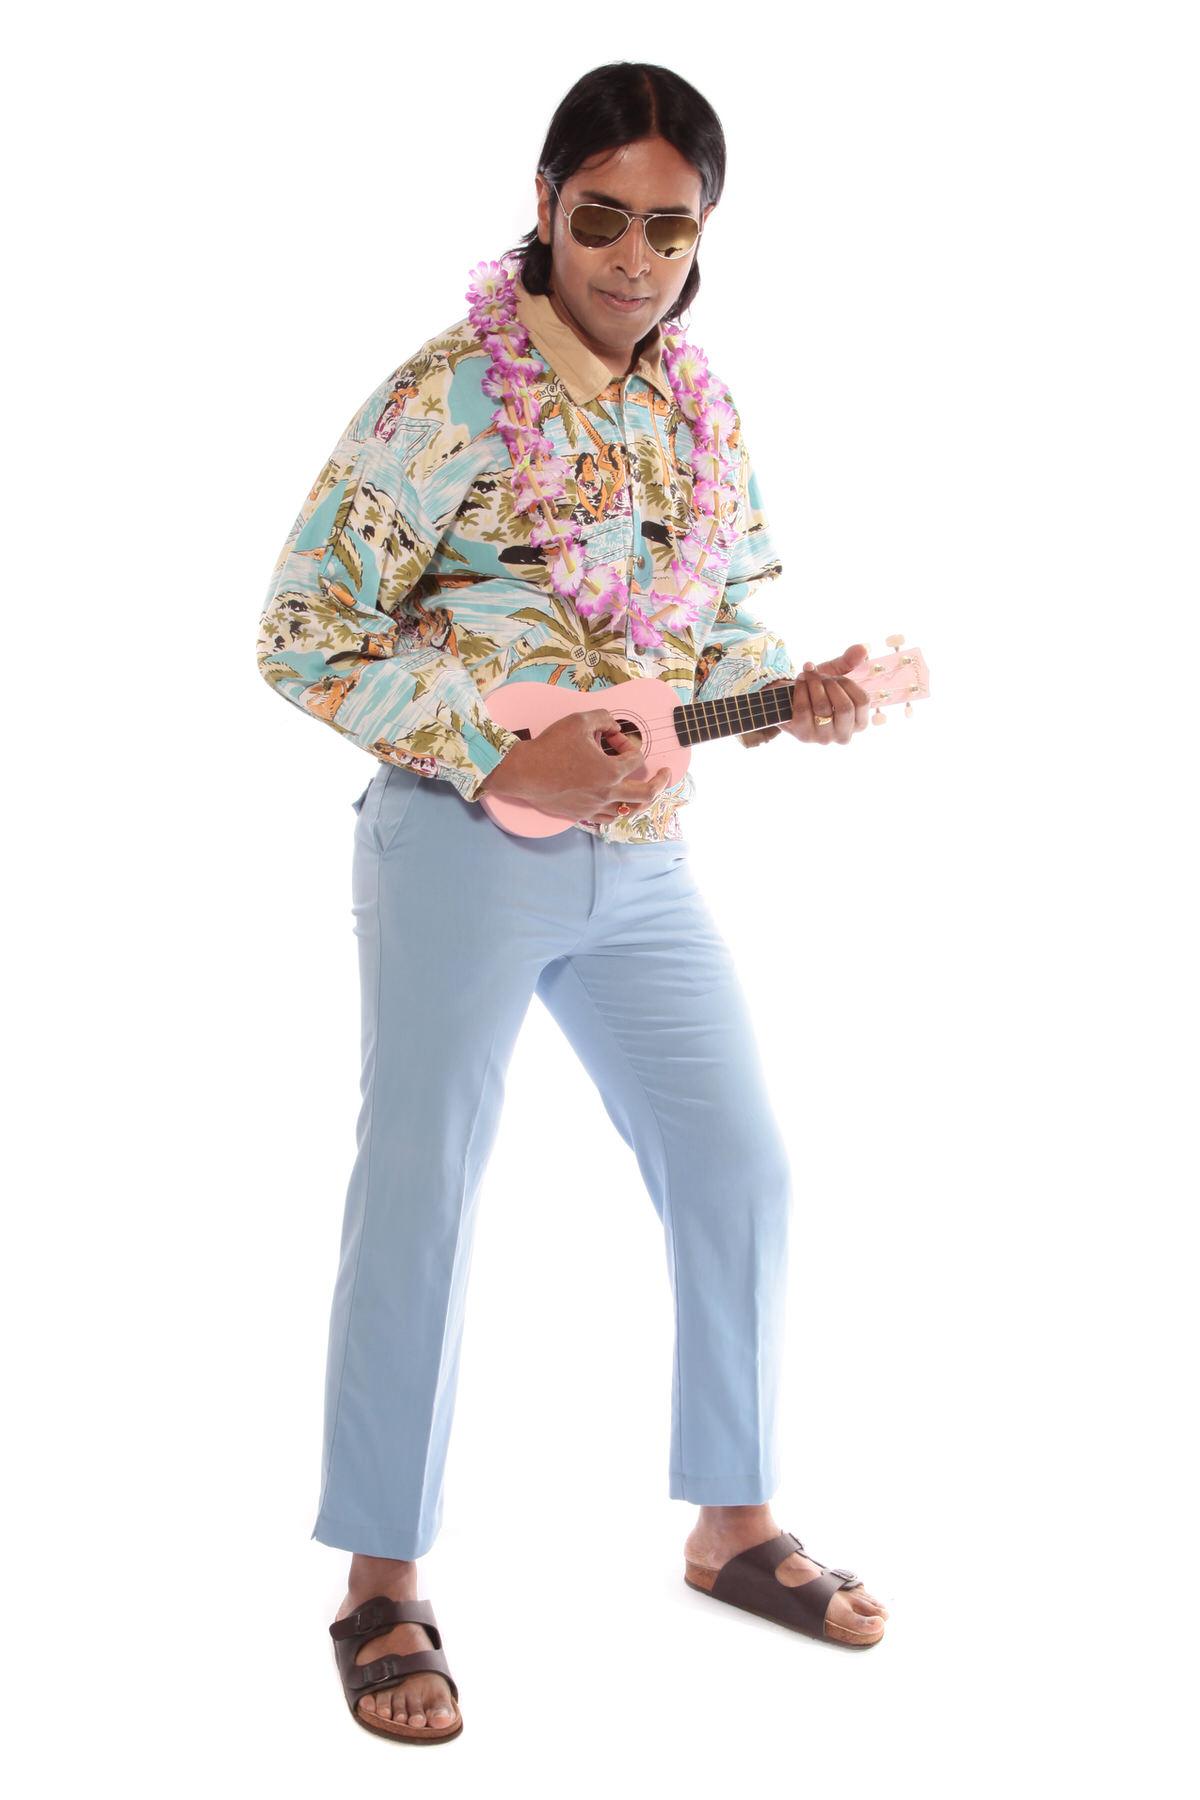 HAWAIIAN ELVIS COSTUME W GENUINE 50s BOMBER JACKET